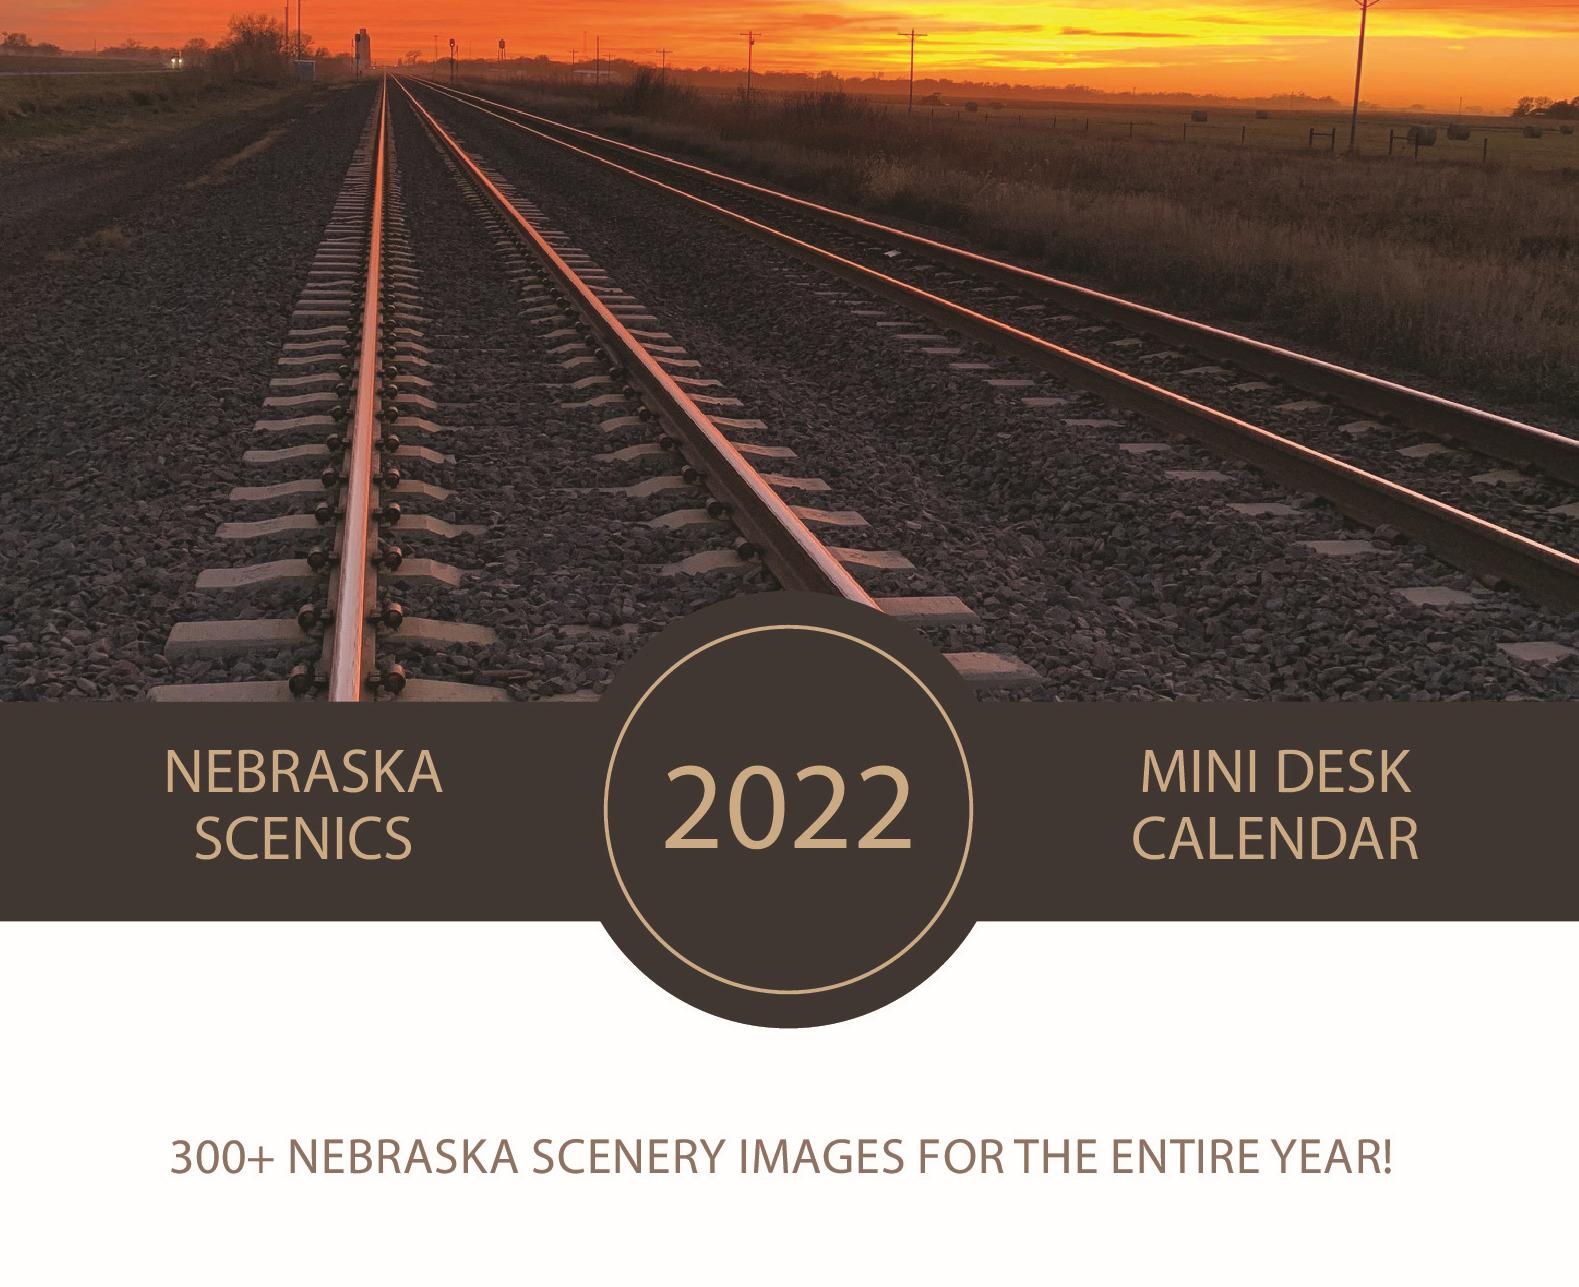 Introducing the Nebraska Scenic Daily Desk Calendar!!